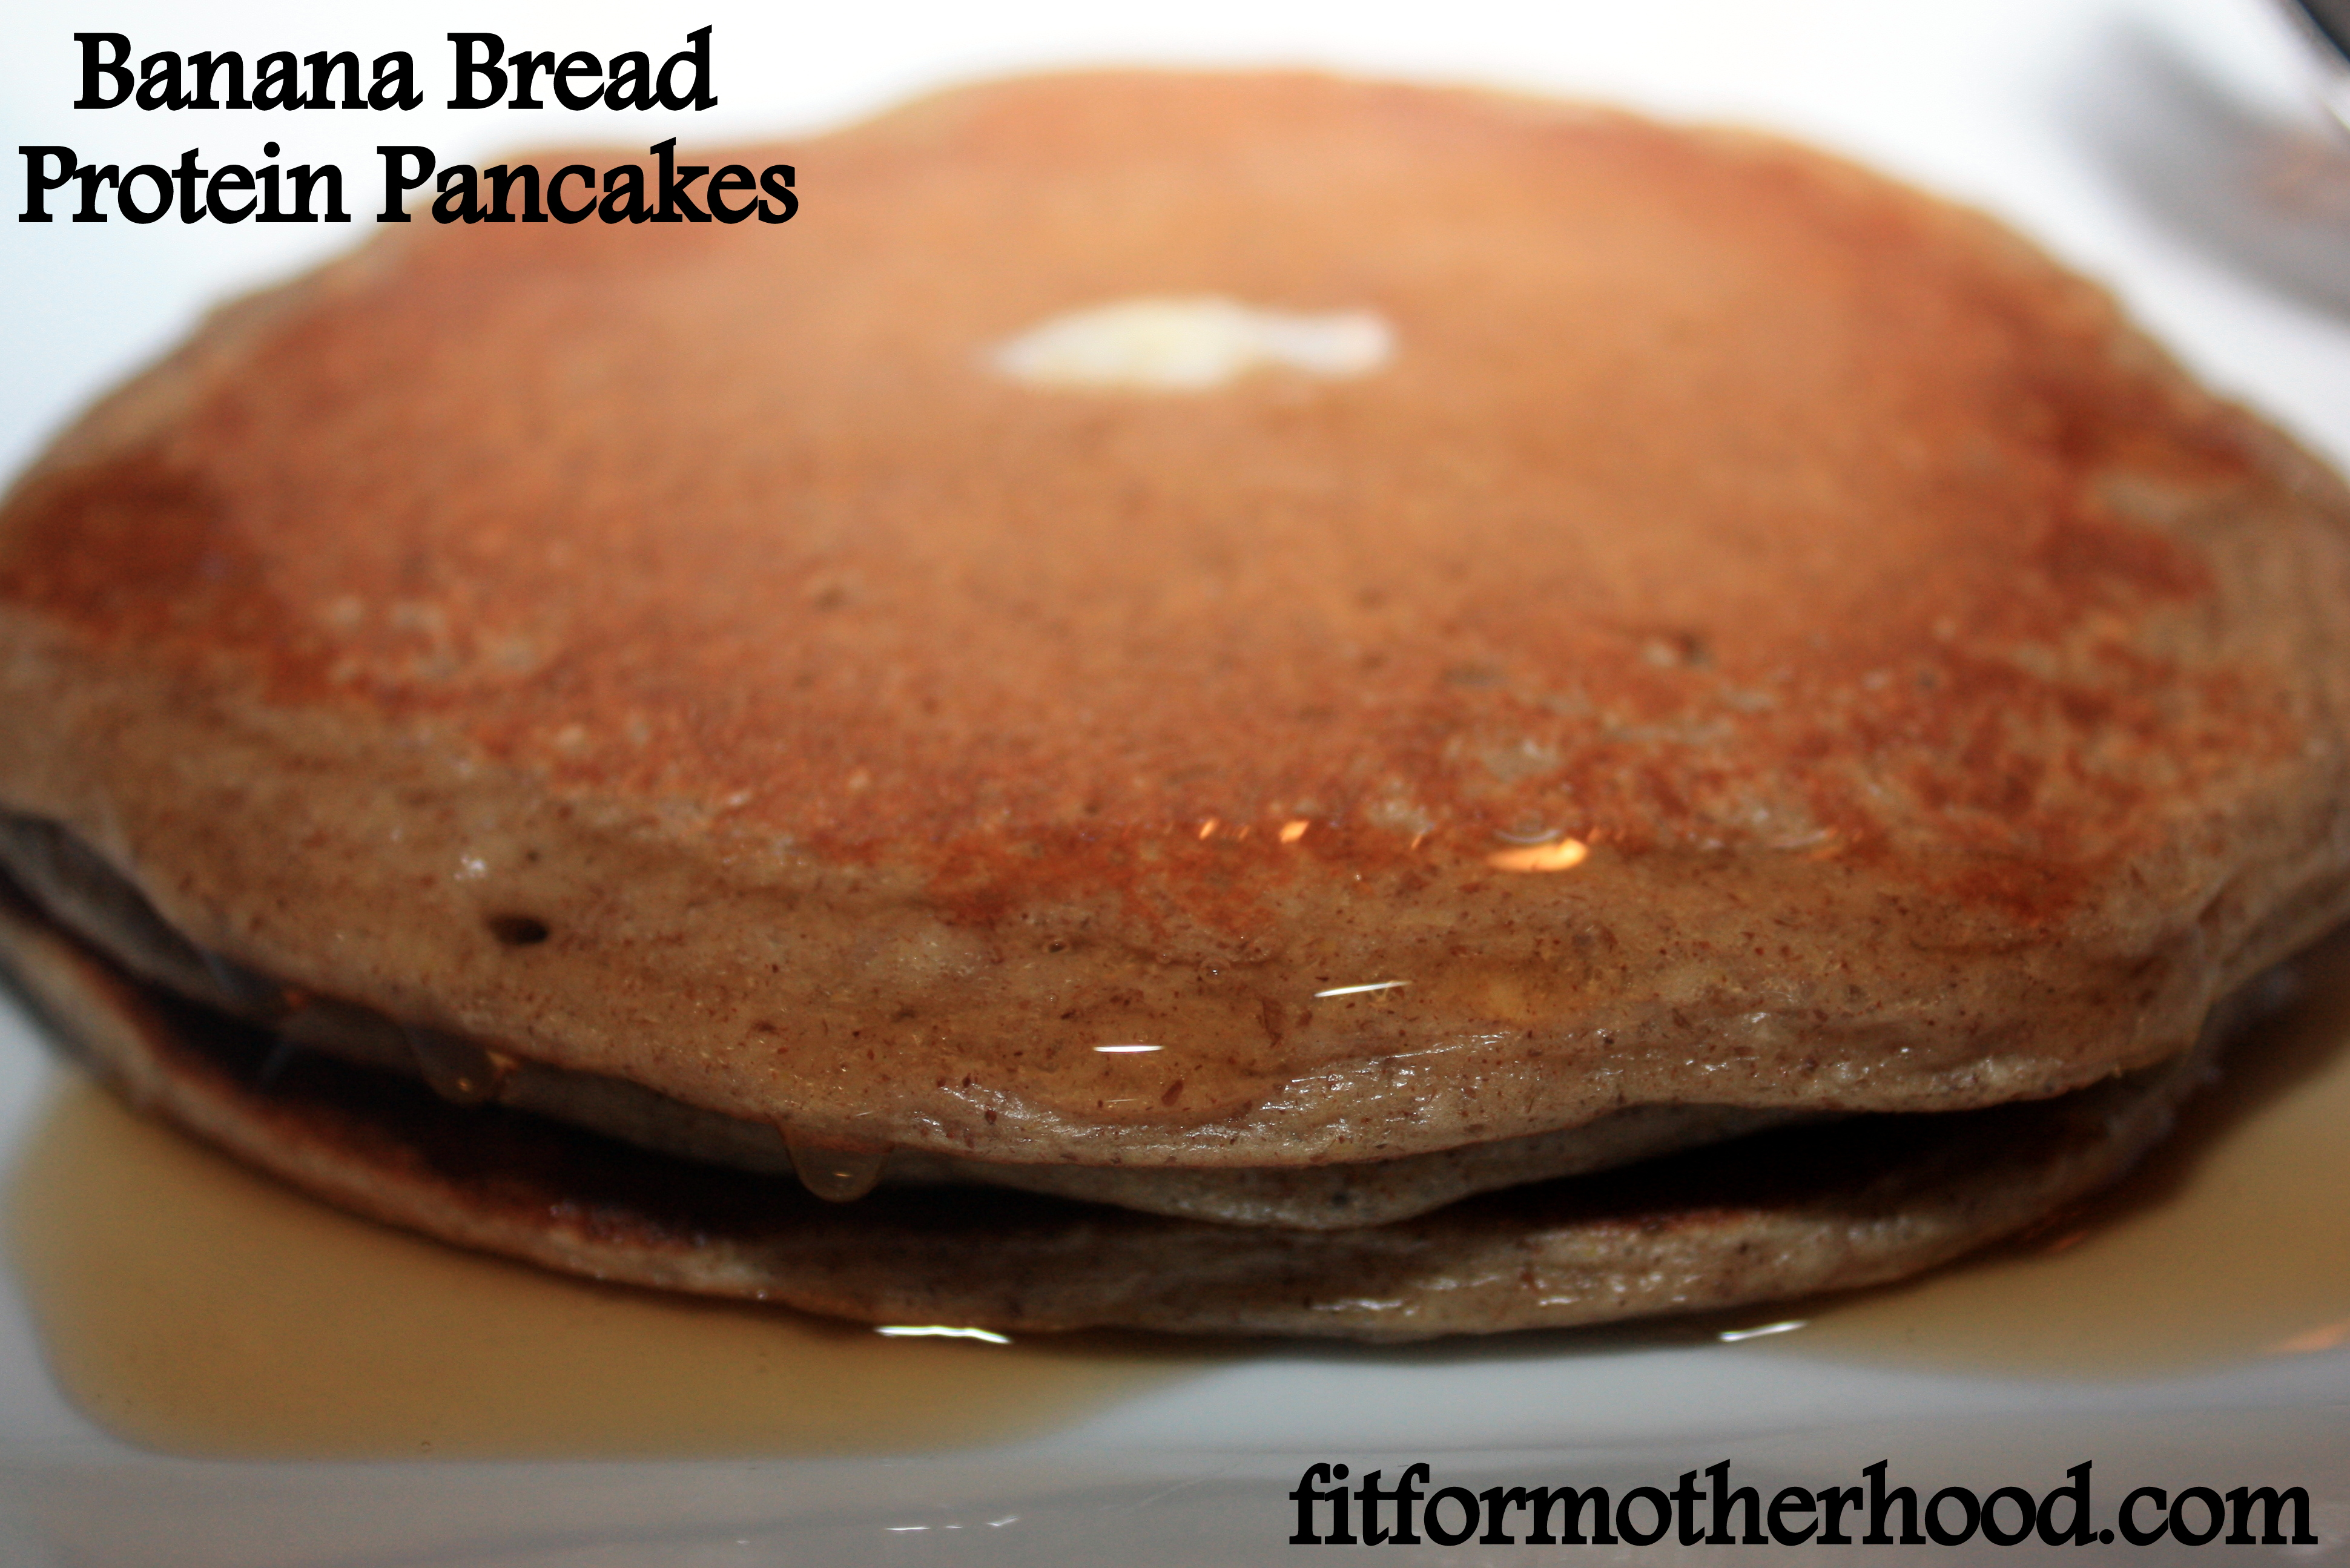 Banana Bread Protein Pancakes (Gluten Free)